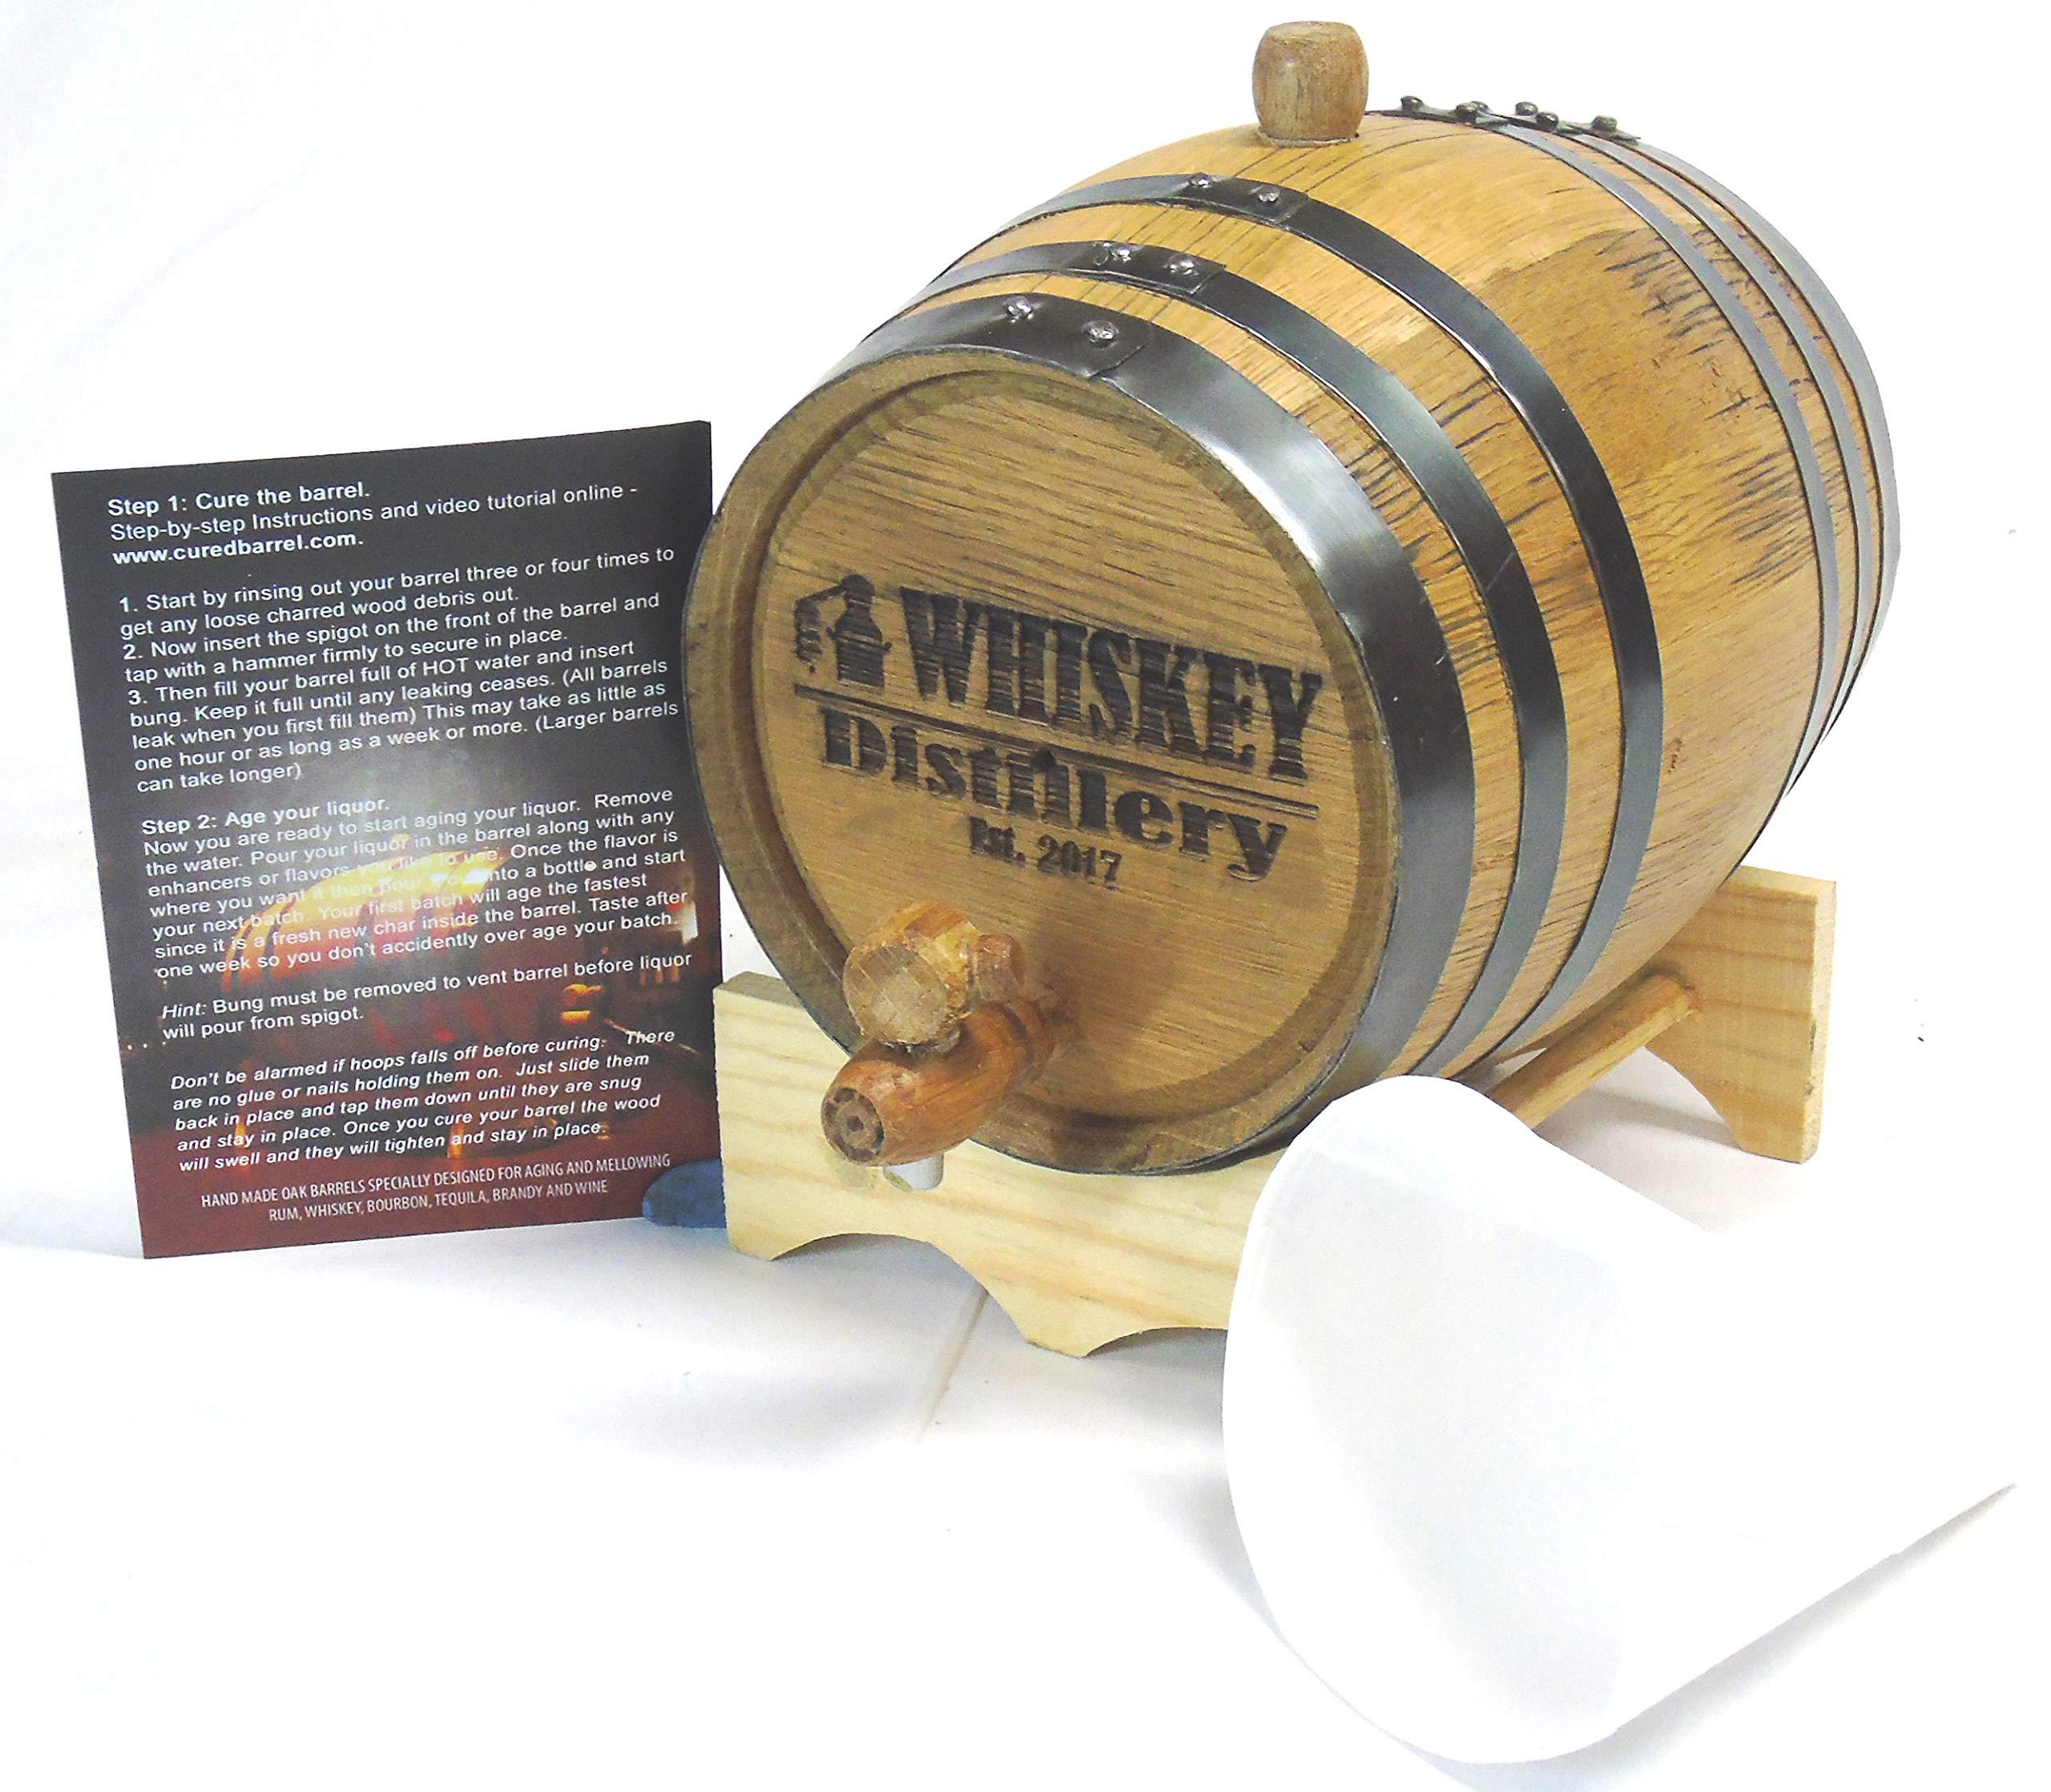 Engraved 2 Liter Charred American White Oak Aging Barrel (Whiskey Distillery)